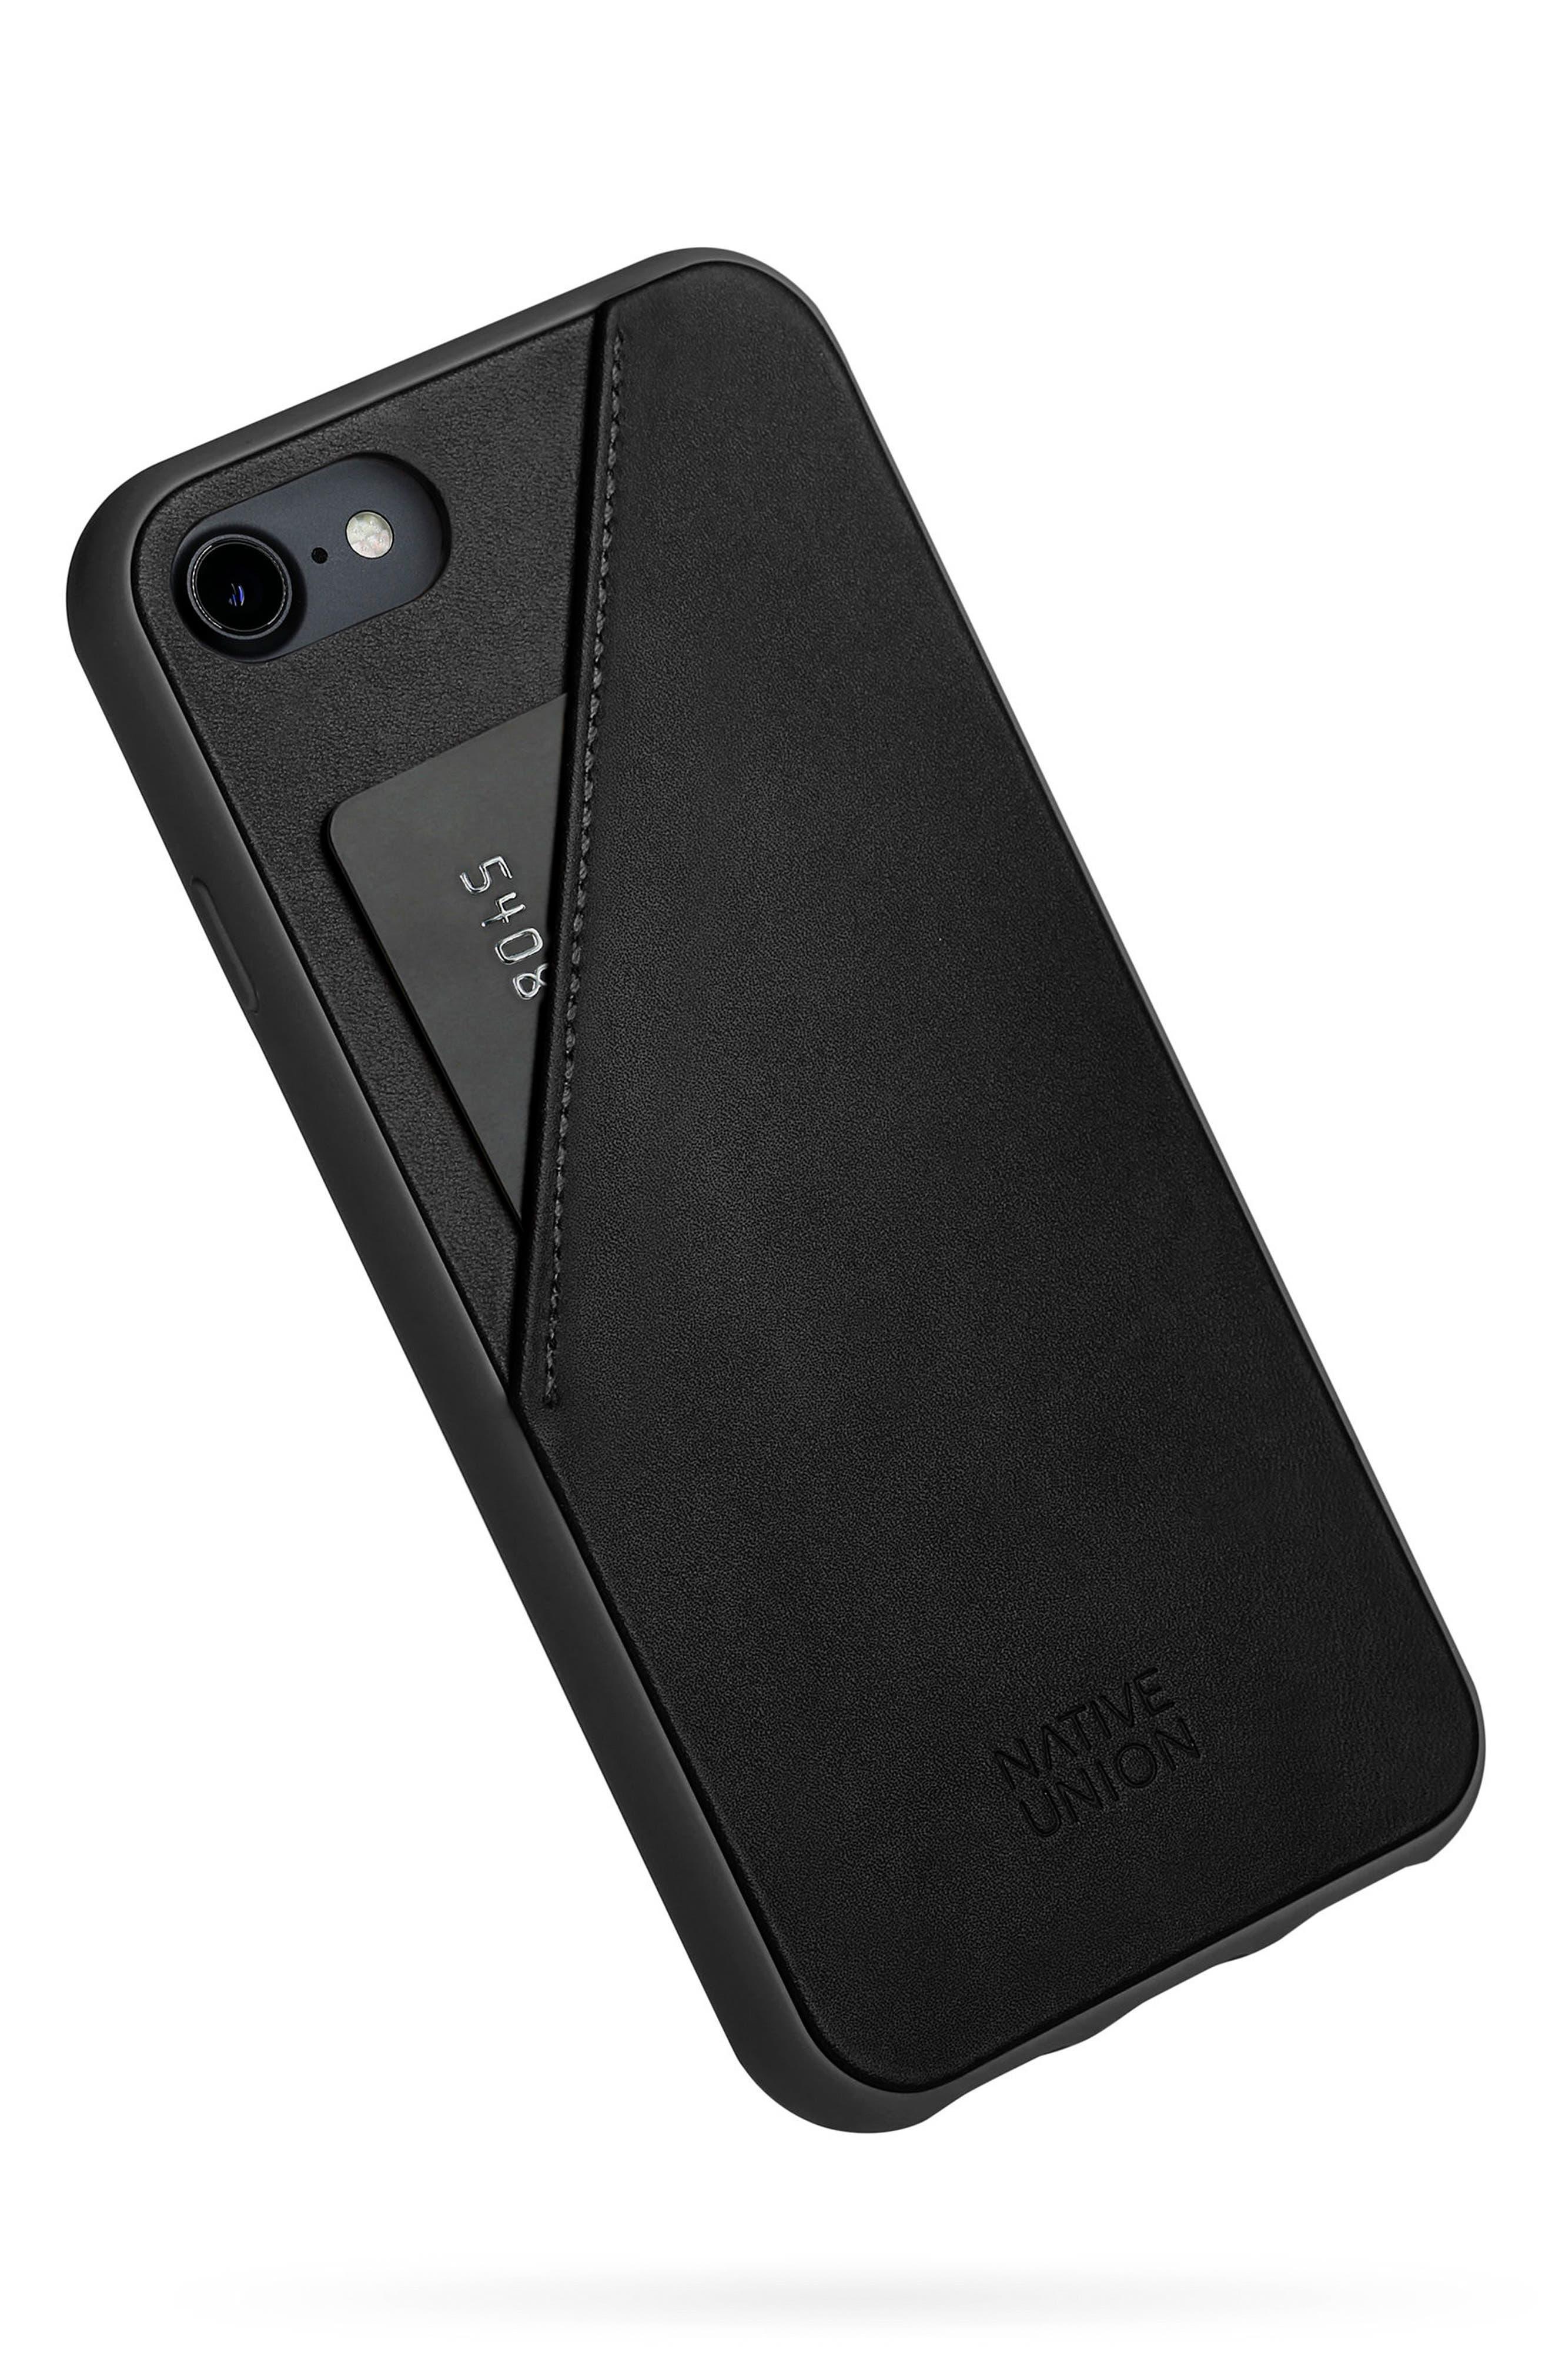 CLIC Card iPhone 7/8 & 7/8 Plus Case,                             Alternate thumbnail 2, color,                             Black/ Black